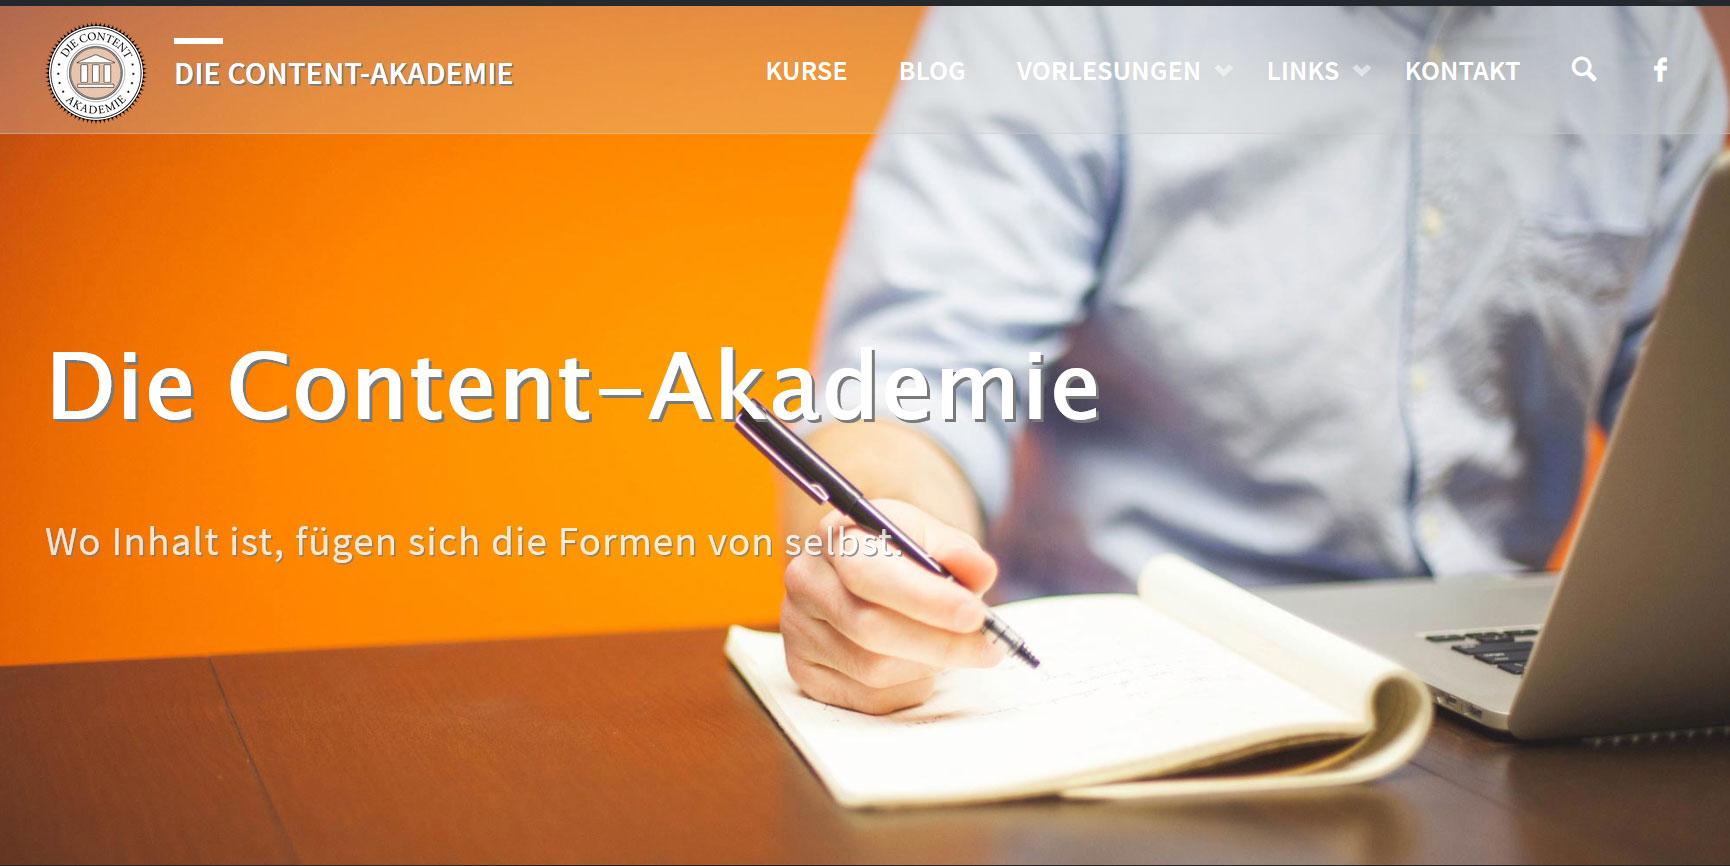 (c) Die-contentakademie.at